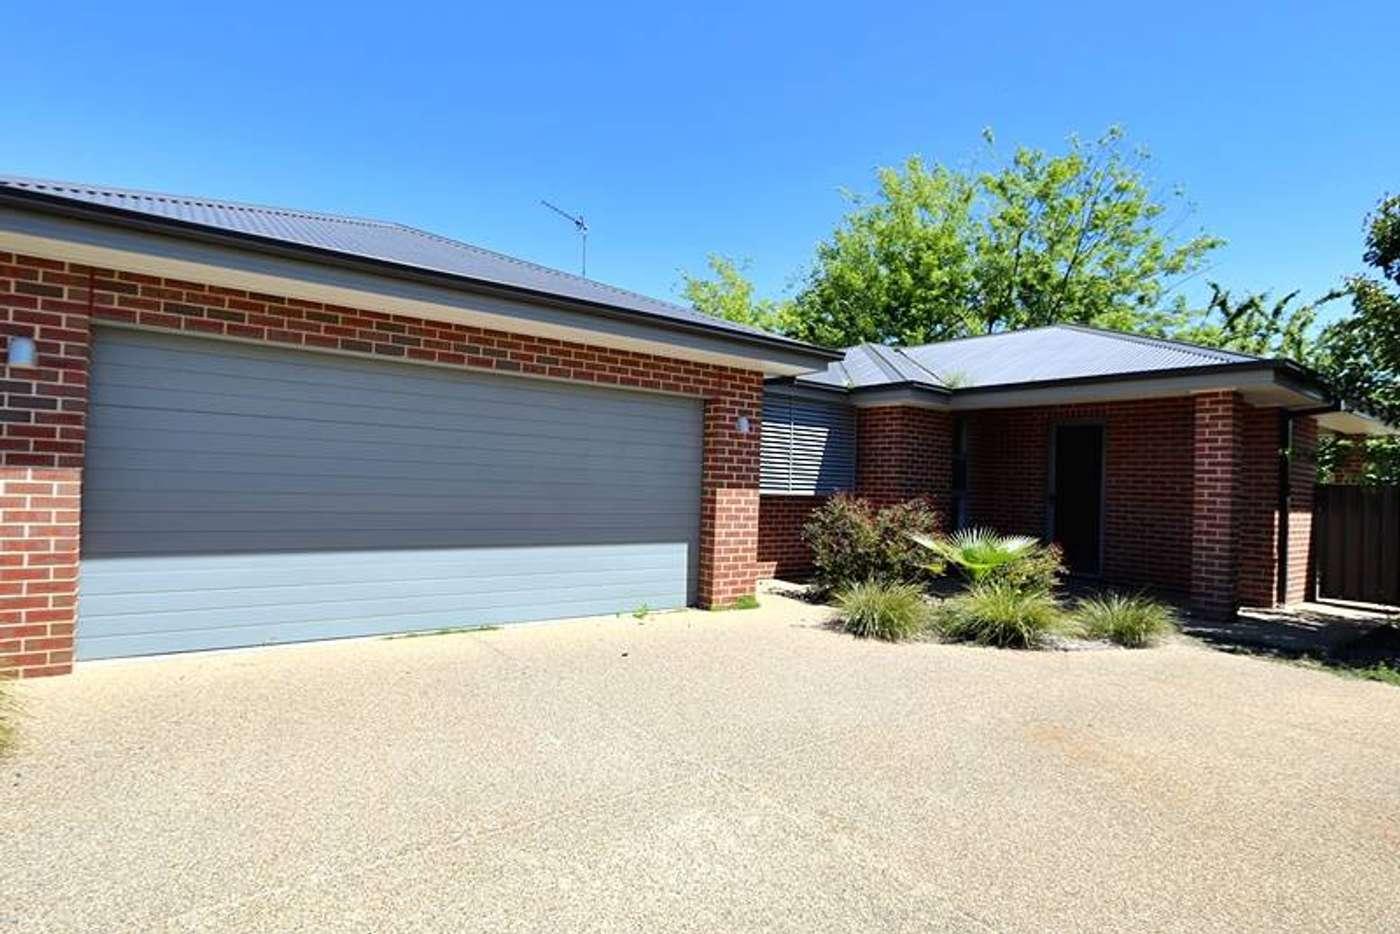 Main view of Homely unit listing, 2/149 Gurwood Street, Wagga Wagga NSW 2650